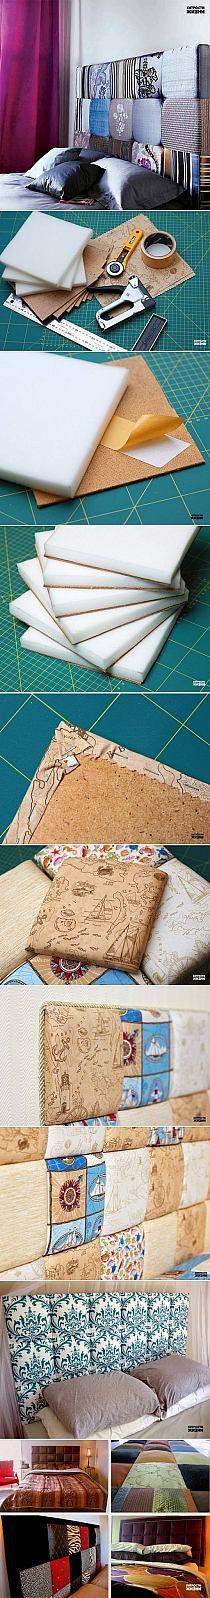 DIY Fruit of Cardboards DIY Projects | UsefulDIY.com